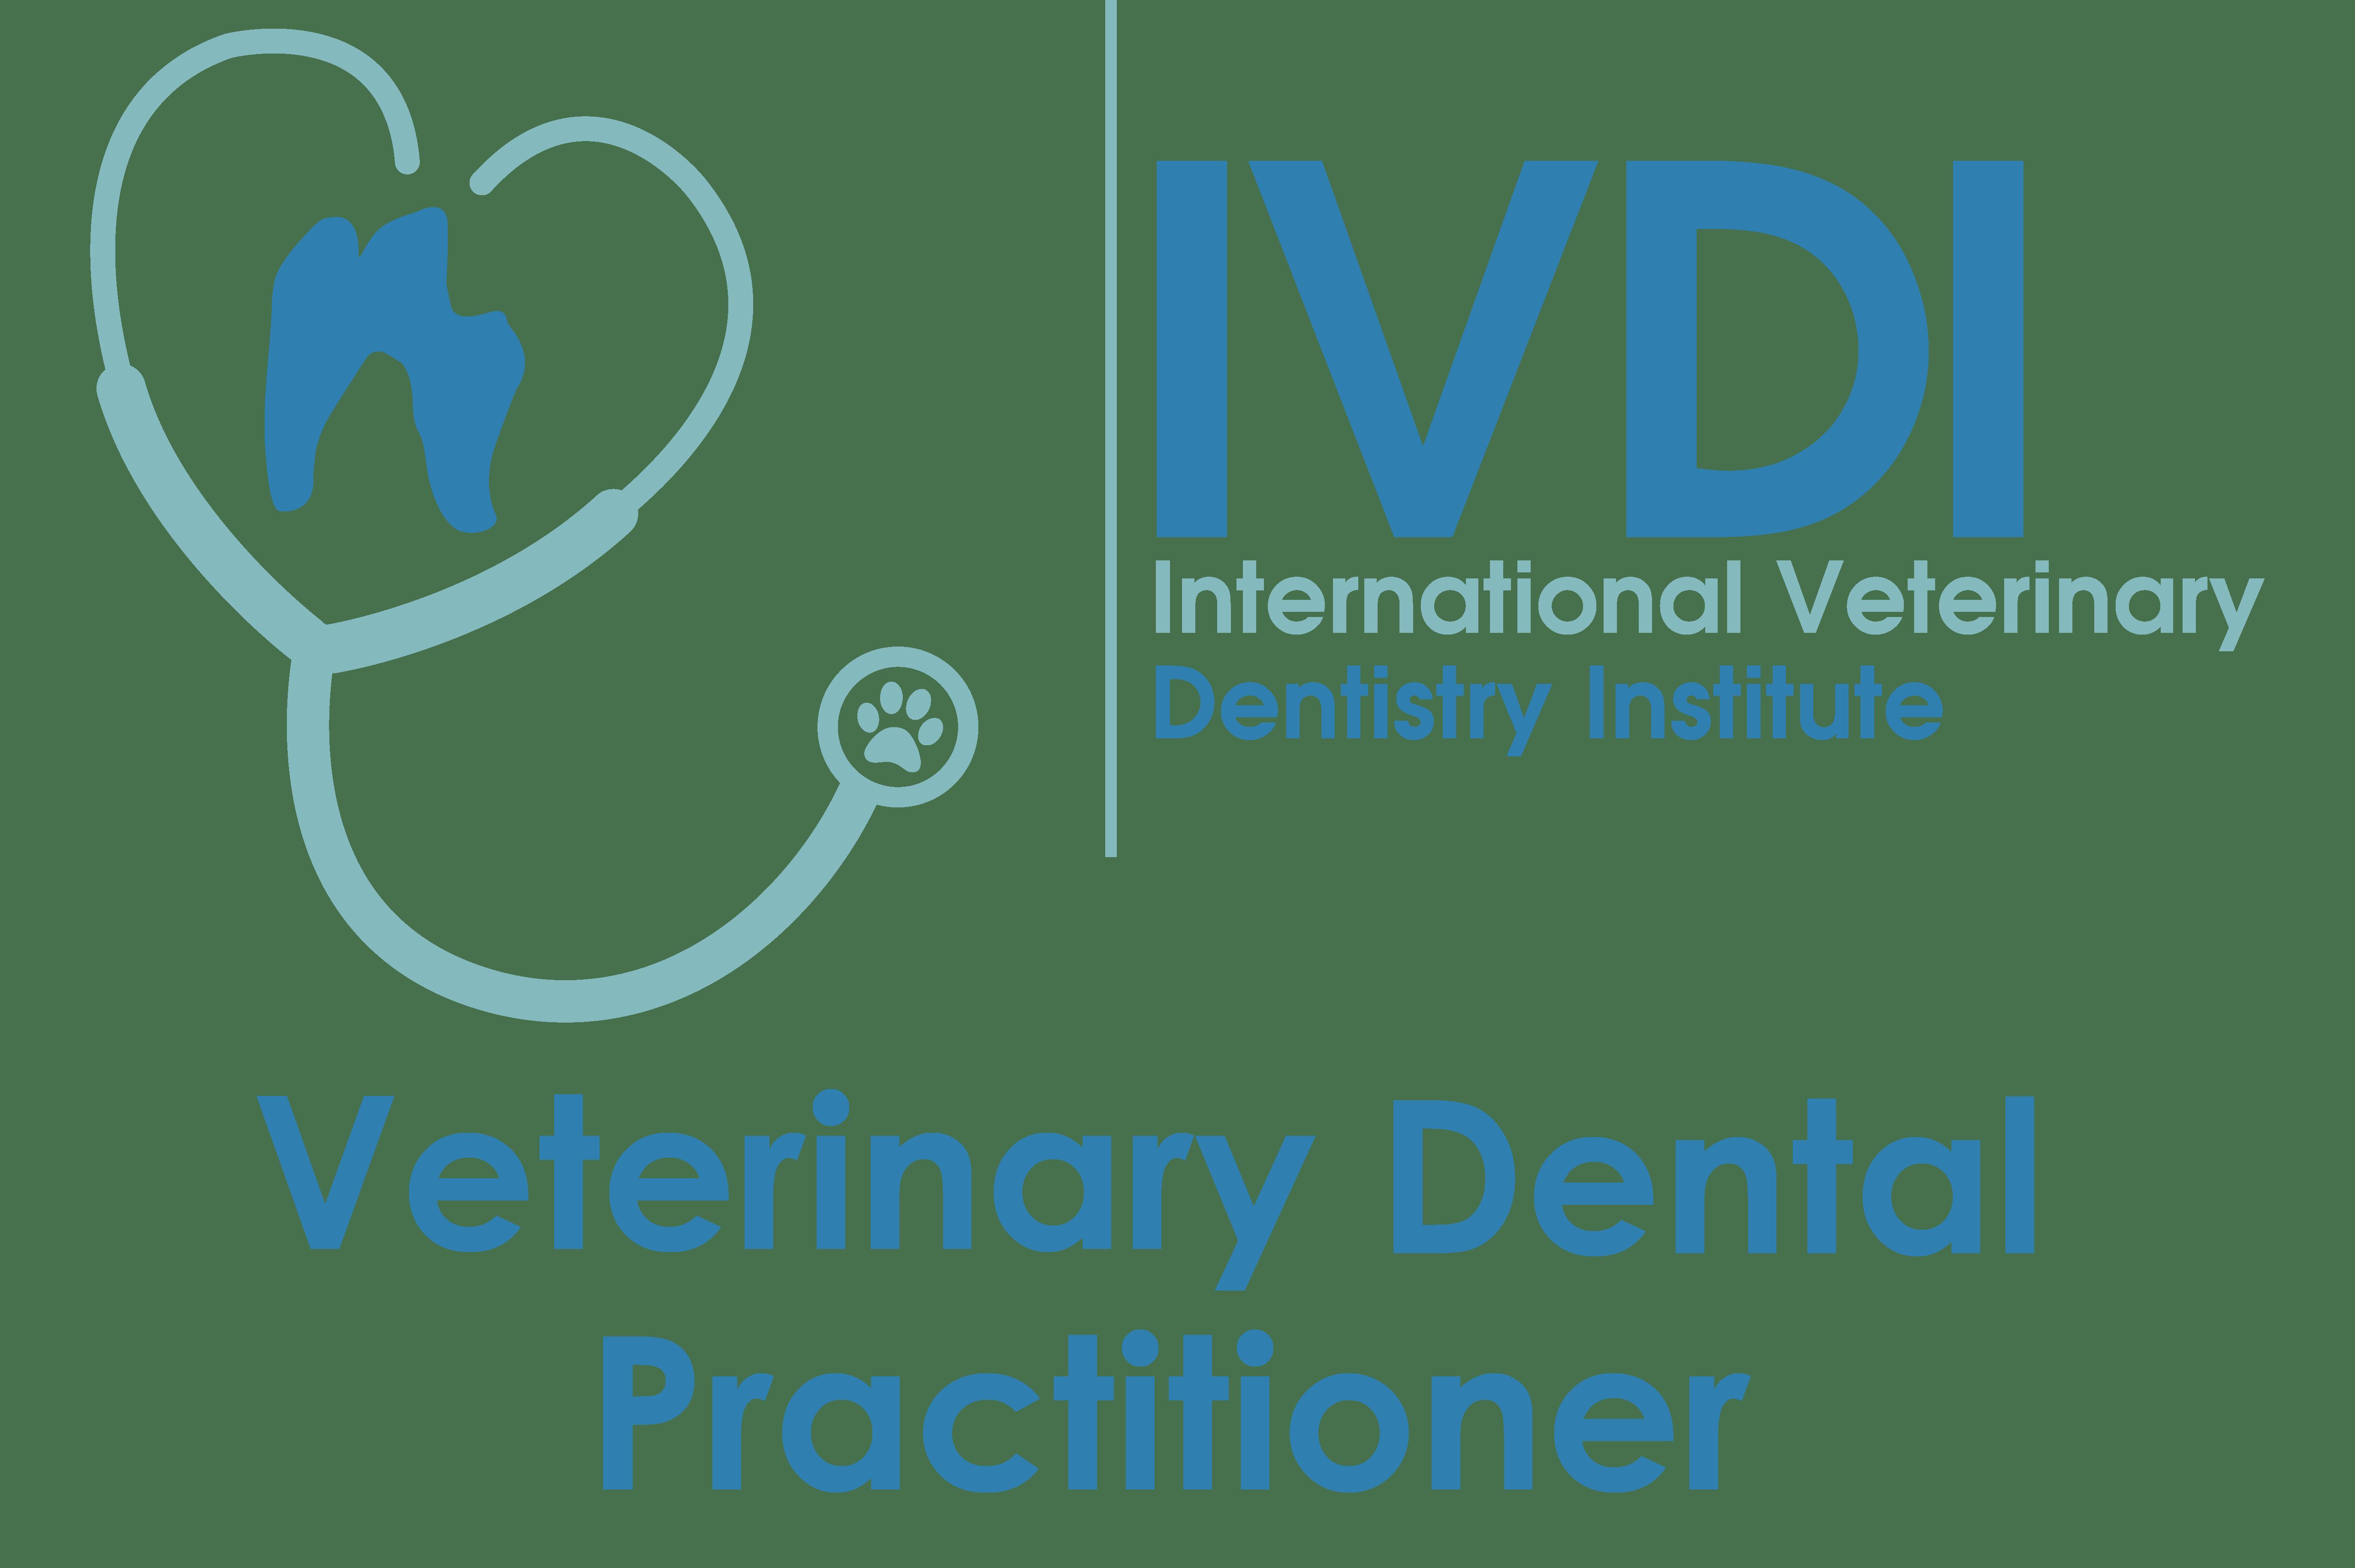 The Logo for International Veterinary Dentistry Institutes Veterinary Dental Practitioner program